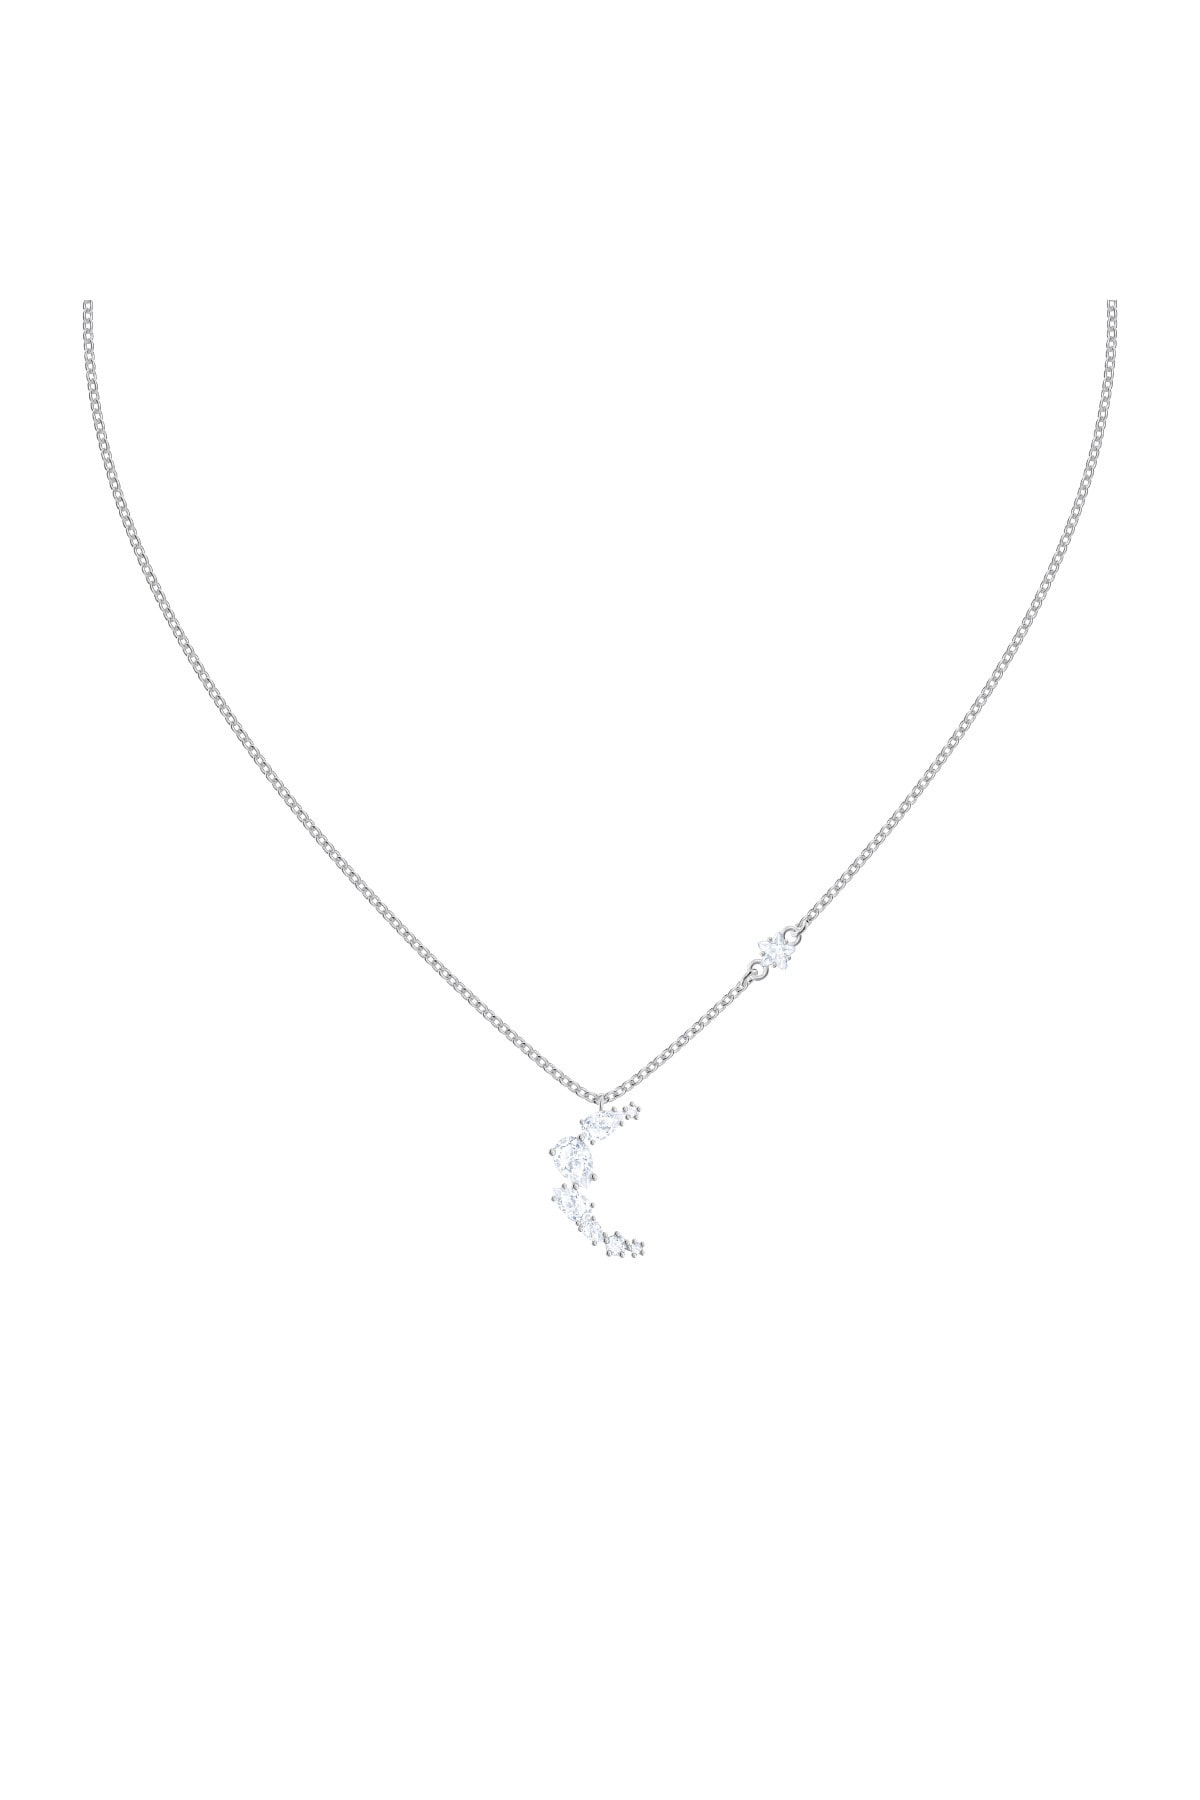 Swarovski Kolye Moonsun:necklace Moon Czwh/rhs 5508442 1